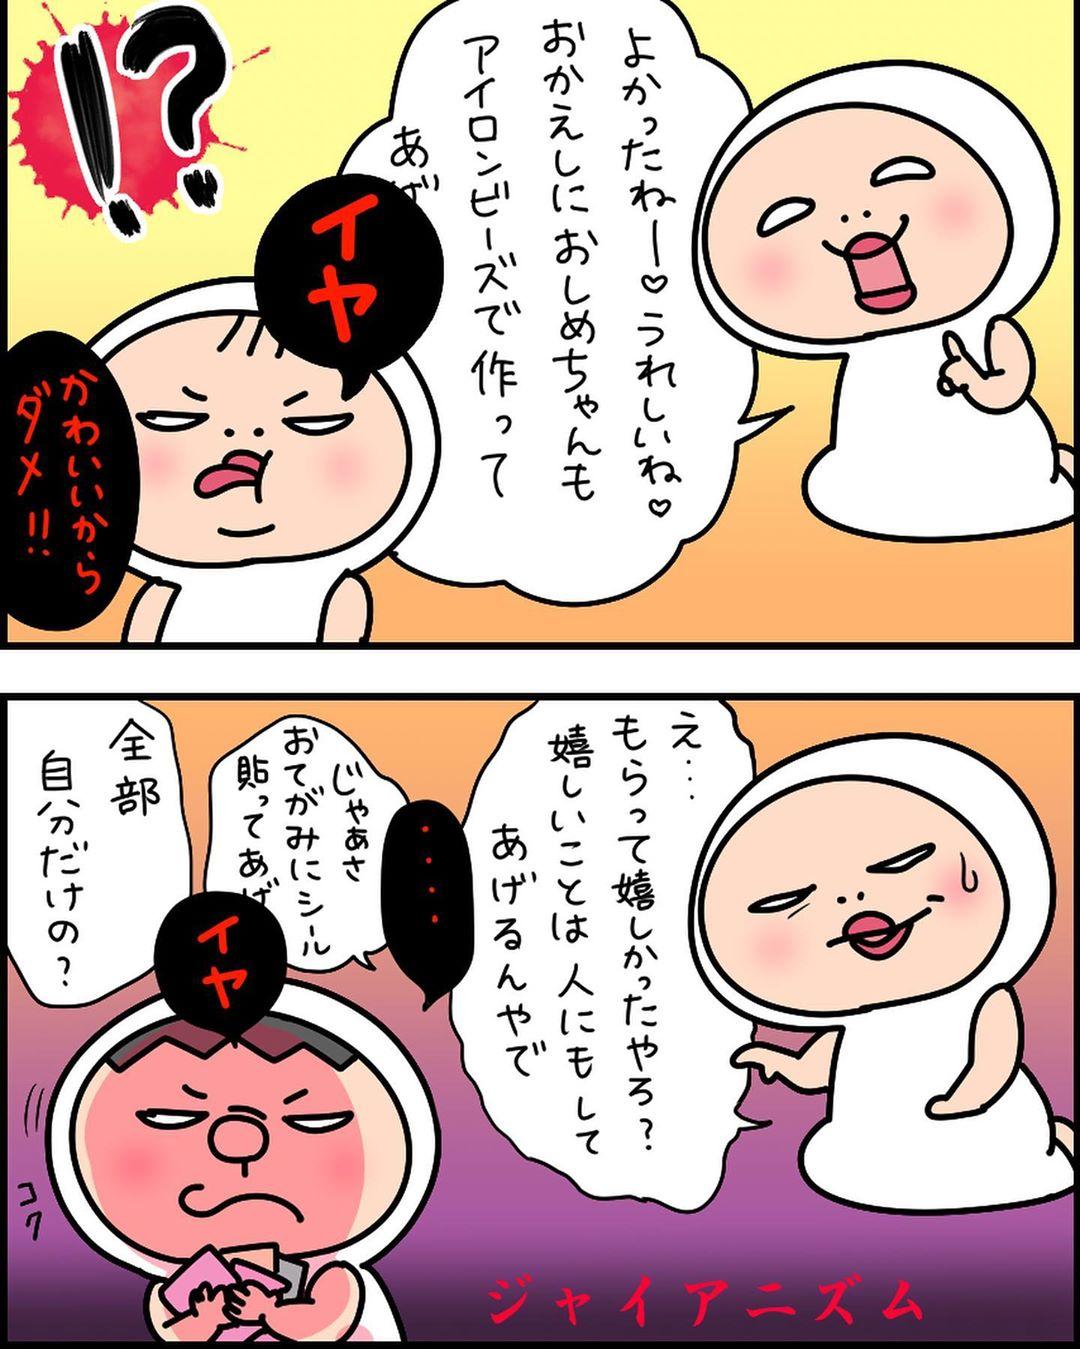 nikunohi029_67097849_698433987268727_3005676636341232070_n